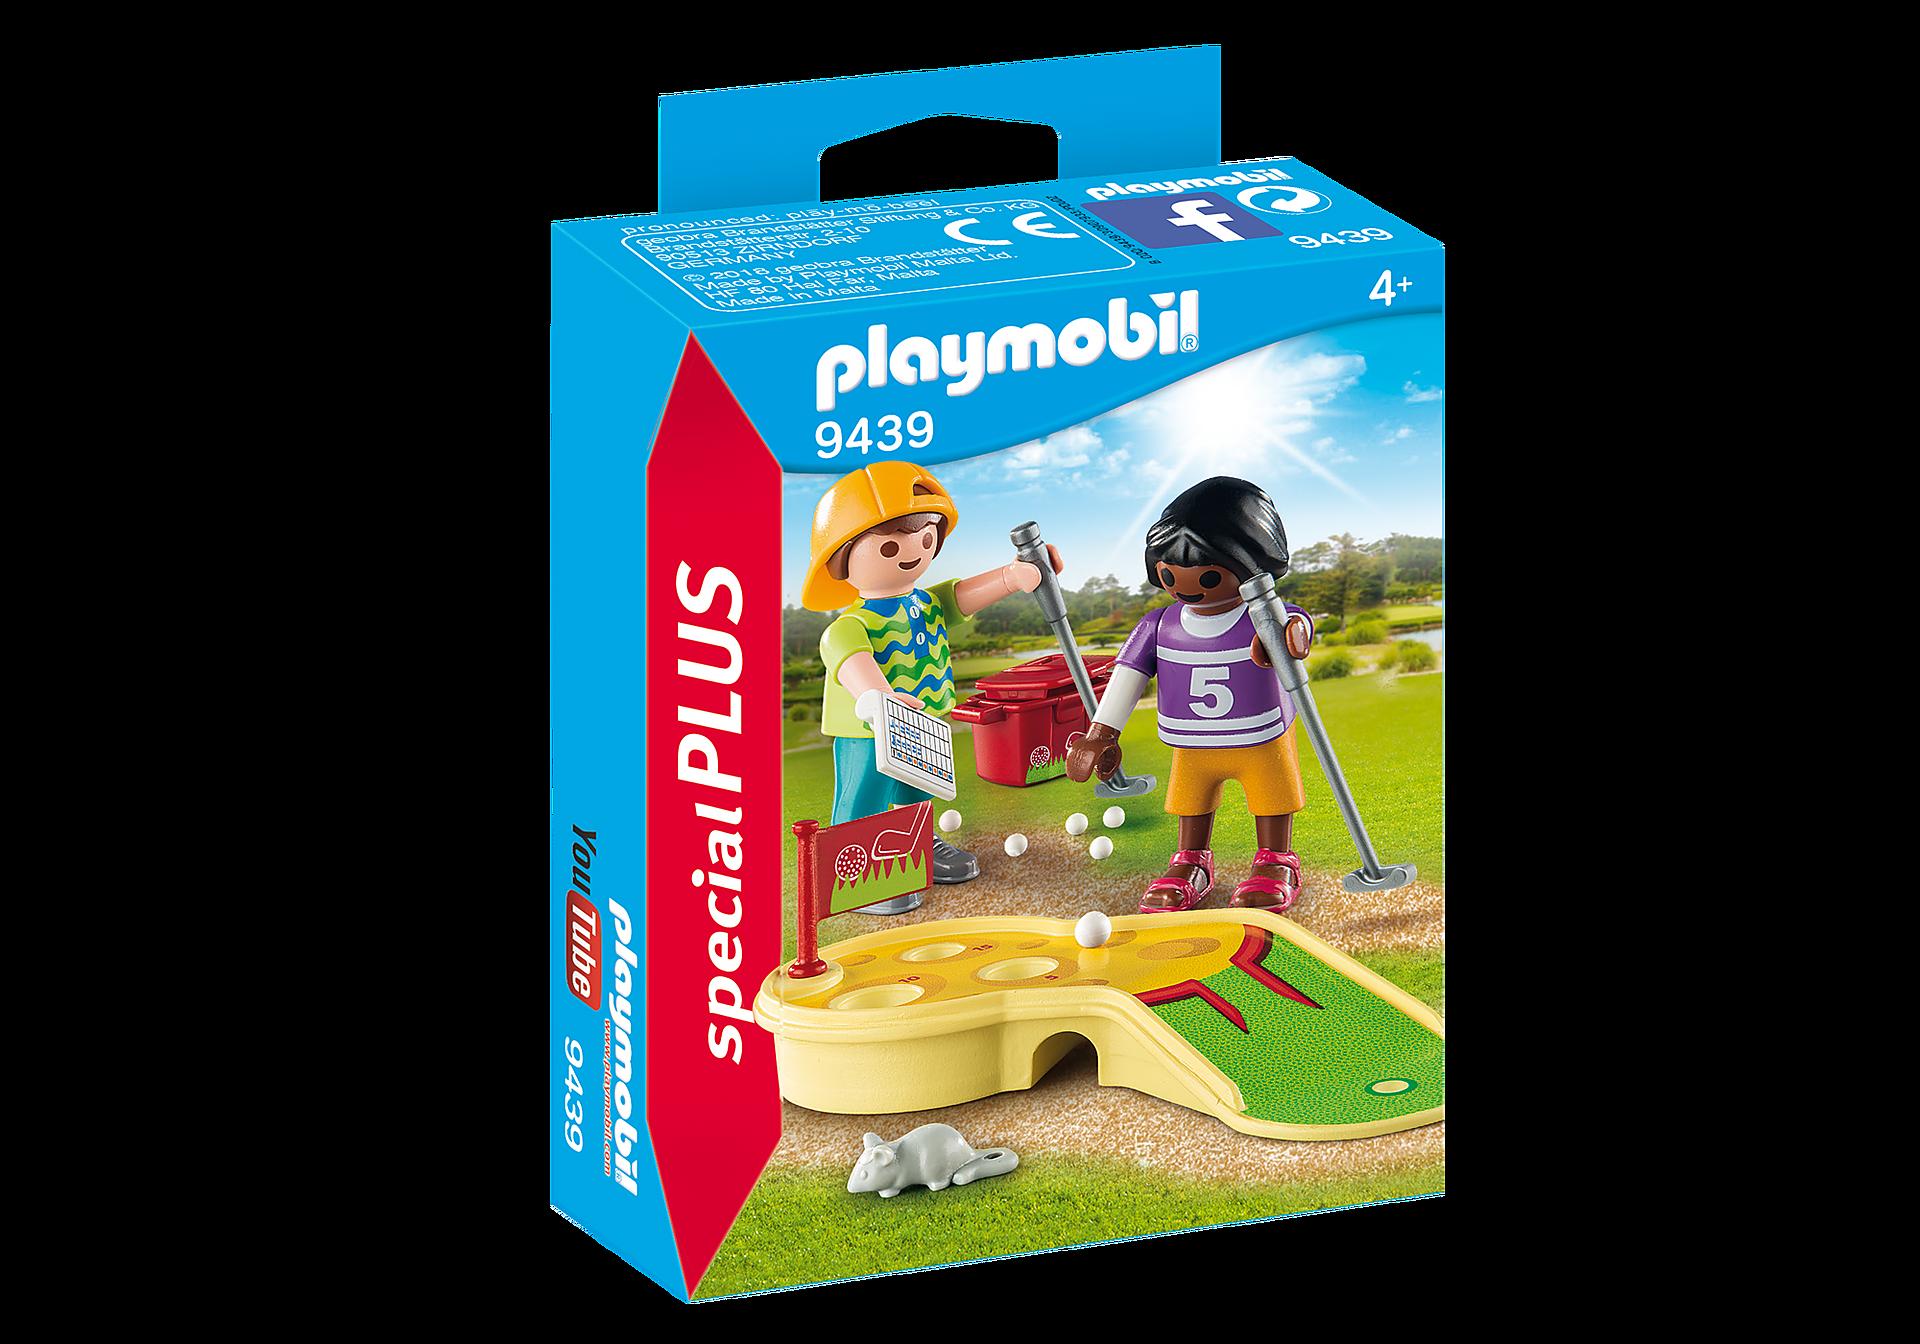 http://media.playmobil.com/i/playmobil/9439_product_box_front/Kinderen met minigolf